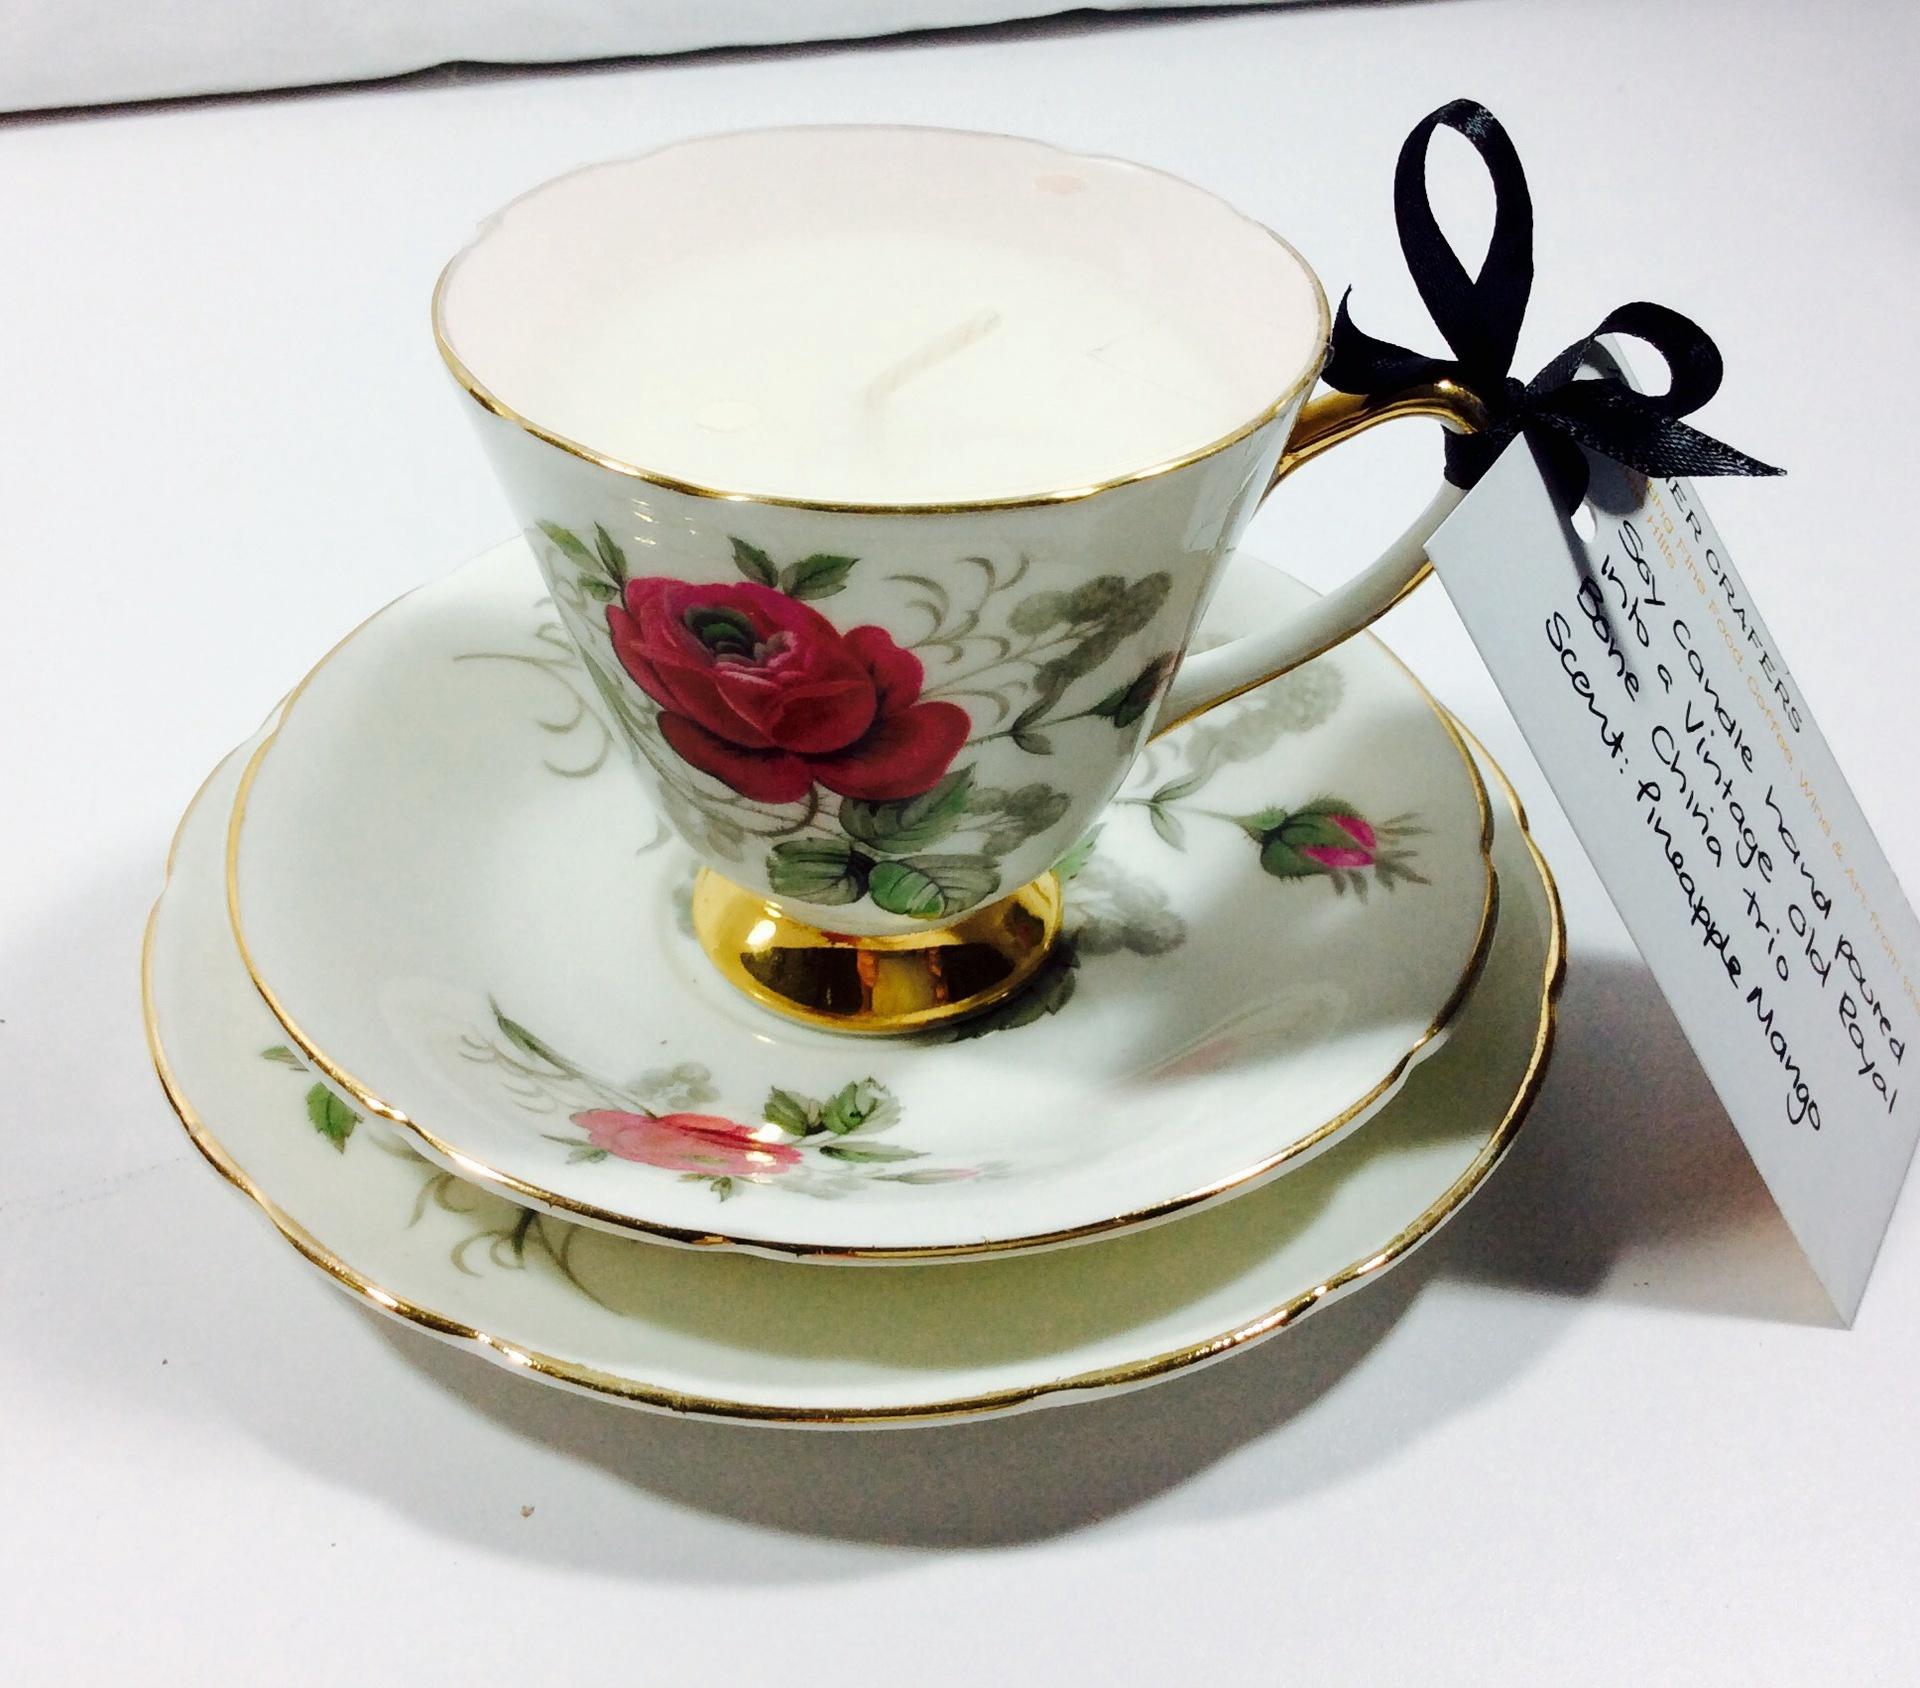 Vintage Tea Cup Candle - Old Royal Trio (1930-41) - Pineapple Mango